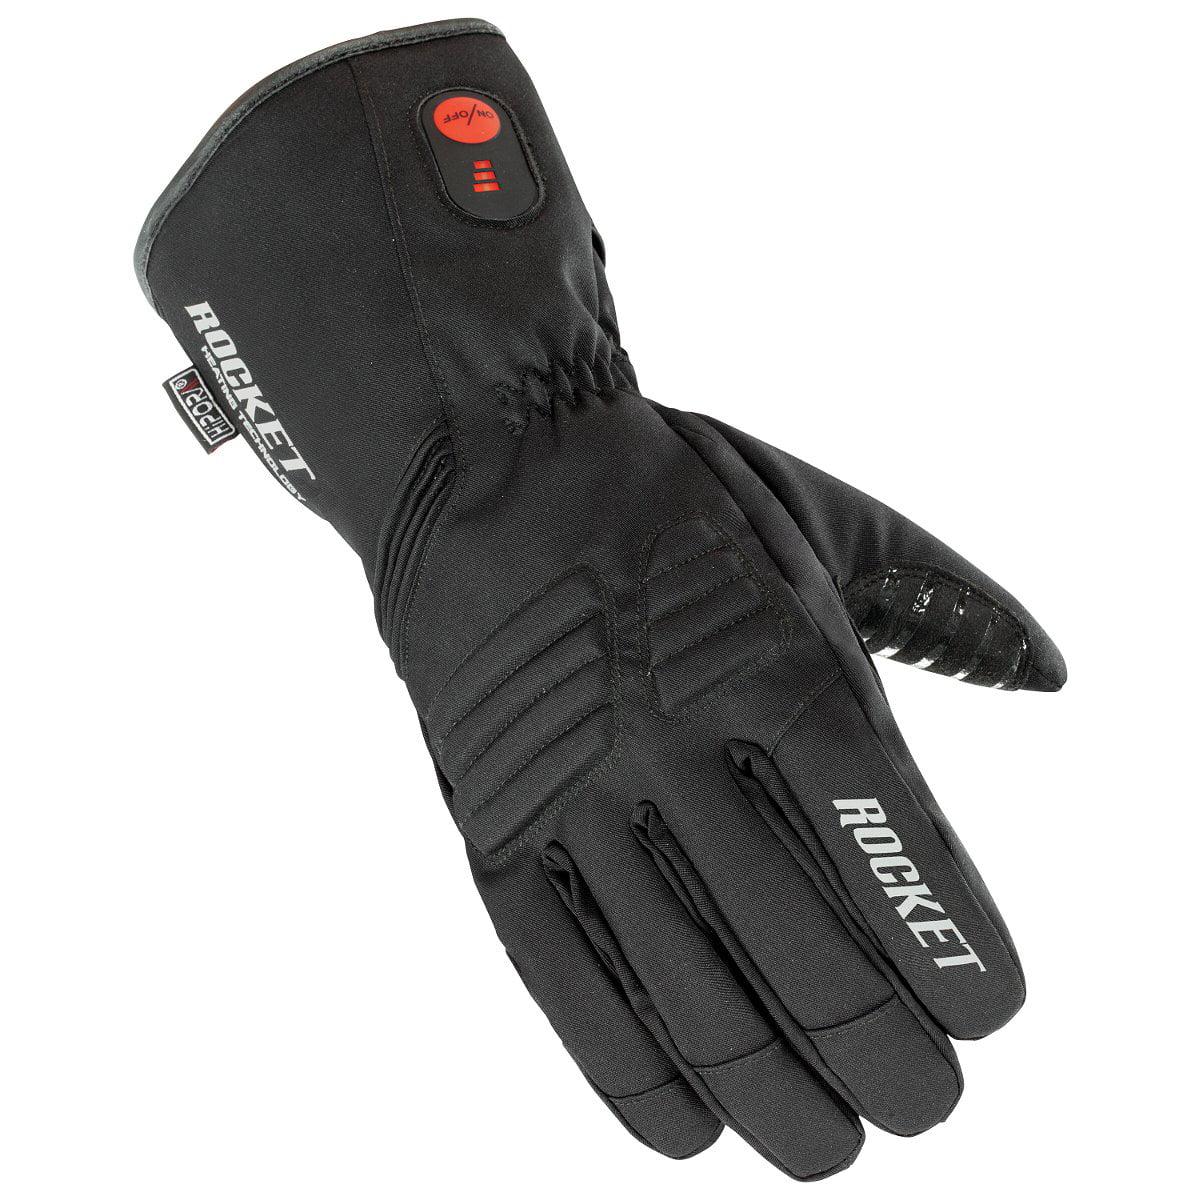 Joe Rocket Rocket Burner Mens Heated Textile Snowmobile Gloves